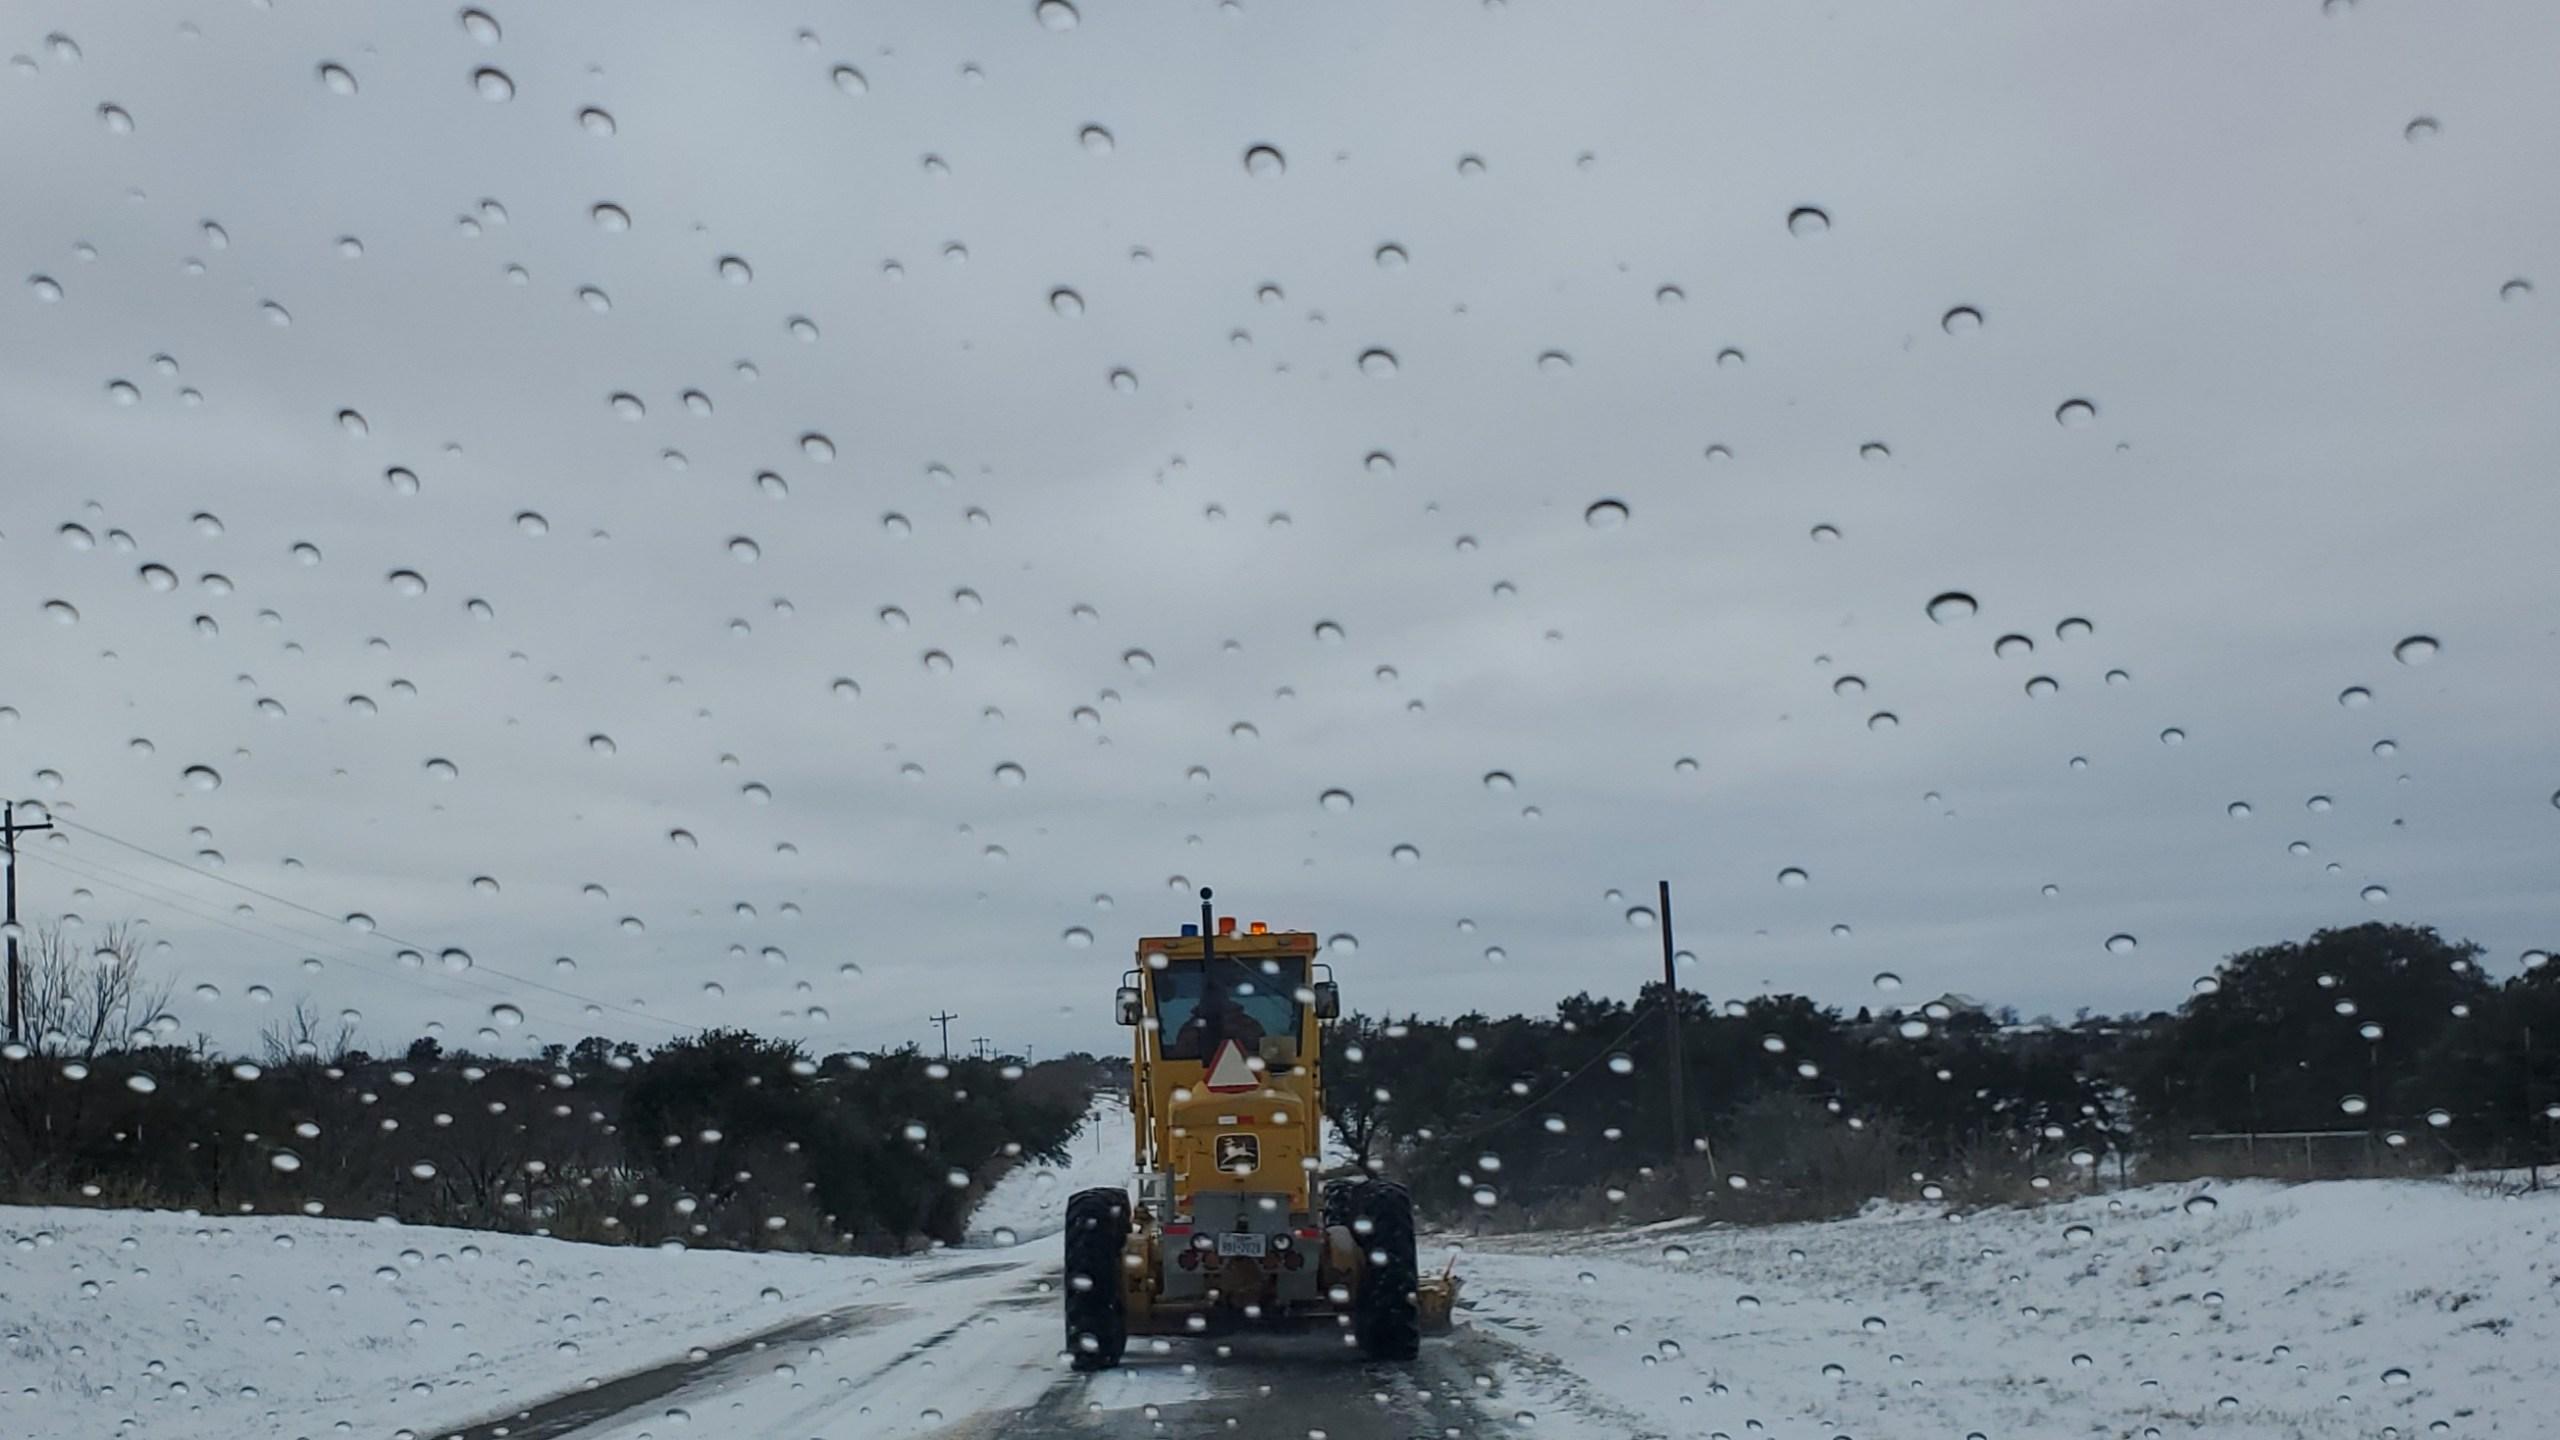 Llano in snow